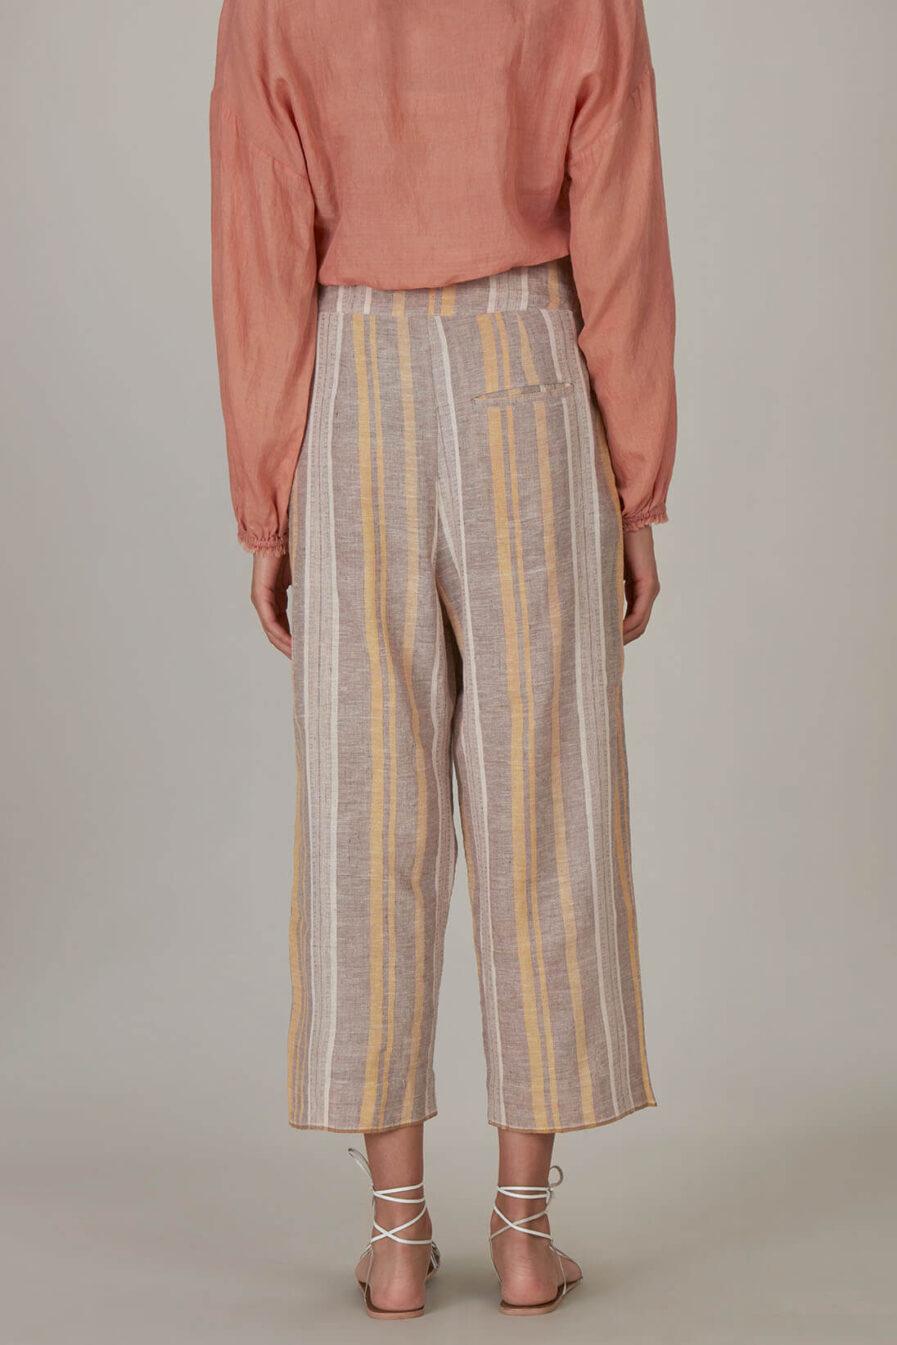 Anavila Fawn Yellow Stripes Trouser